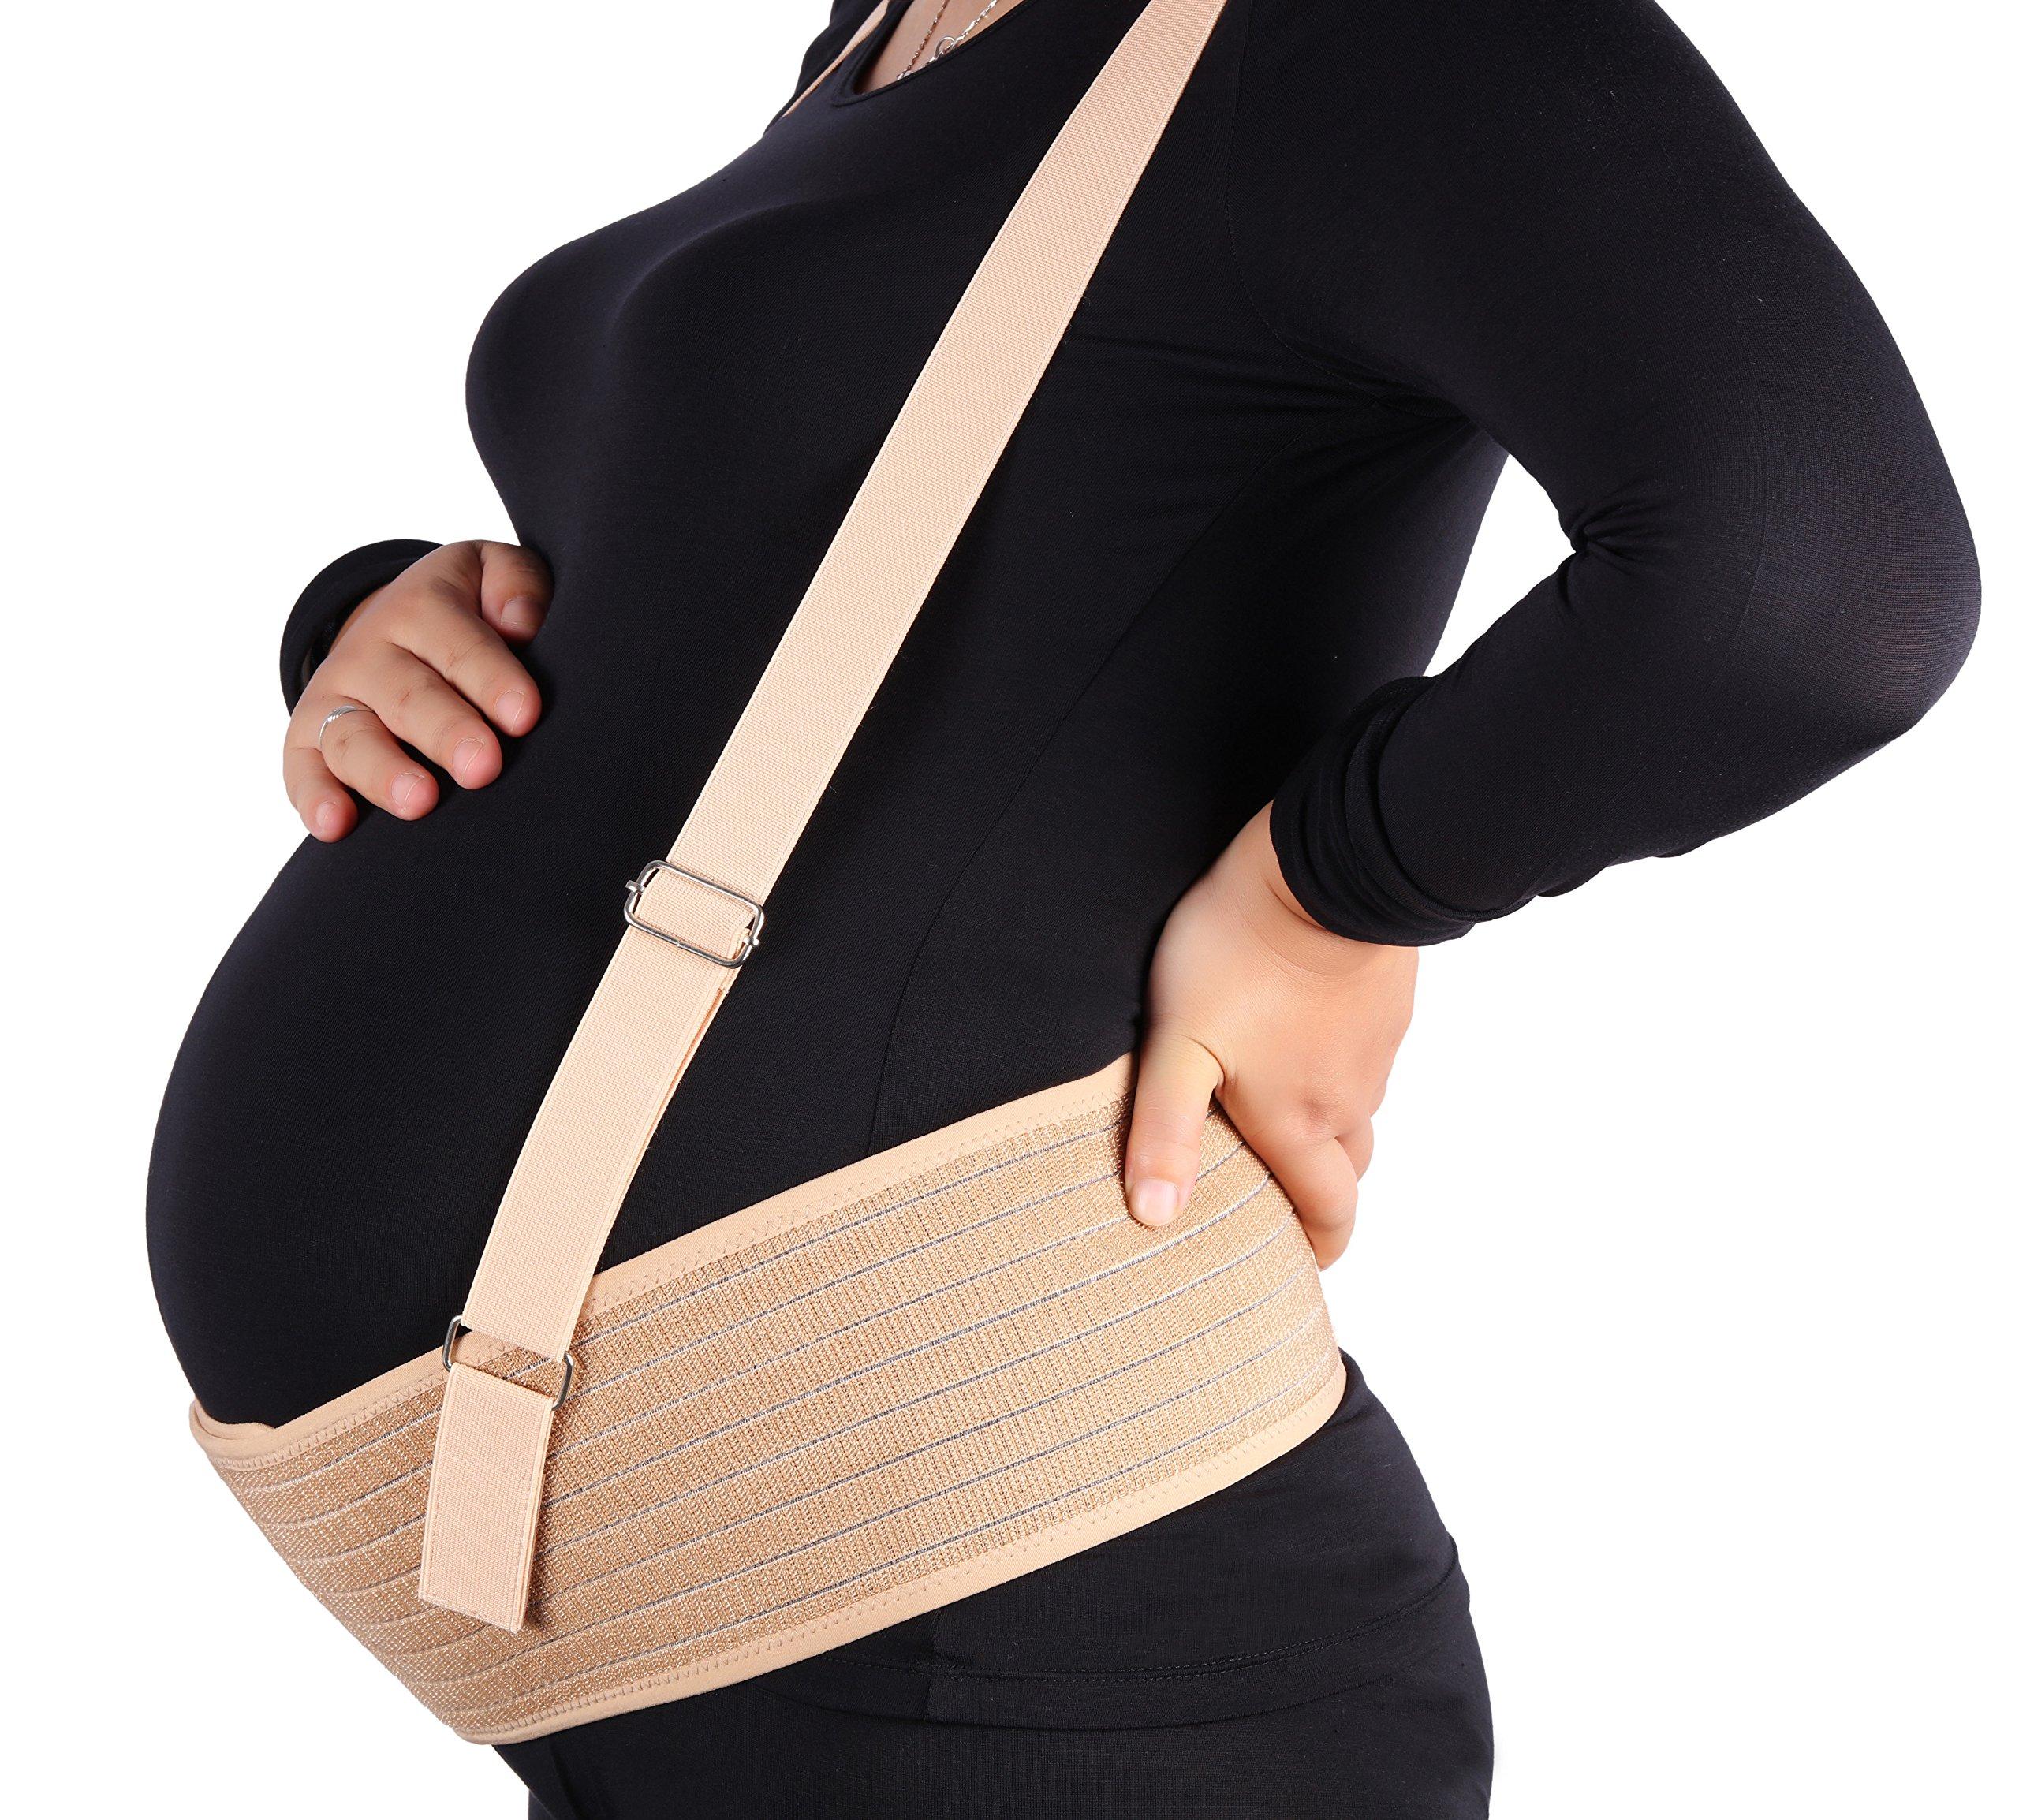 Aigori Maternity belt, Breathable Abdominal Binder, Pelvic and Back Support Belt for Pregnancy with Detachable Shoulder Straps, Women Postnatal Belly Band Prenatal Cradle